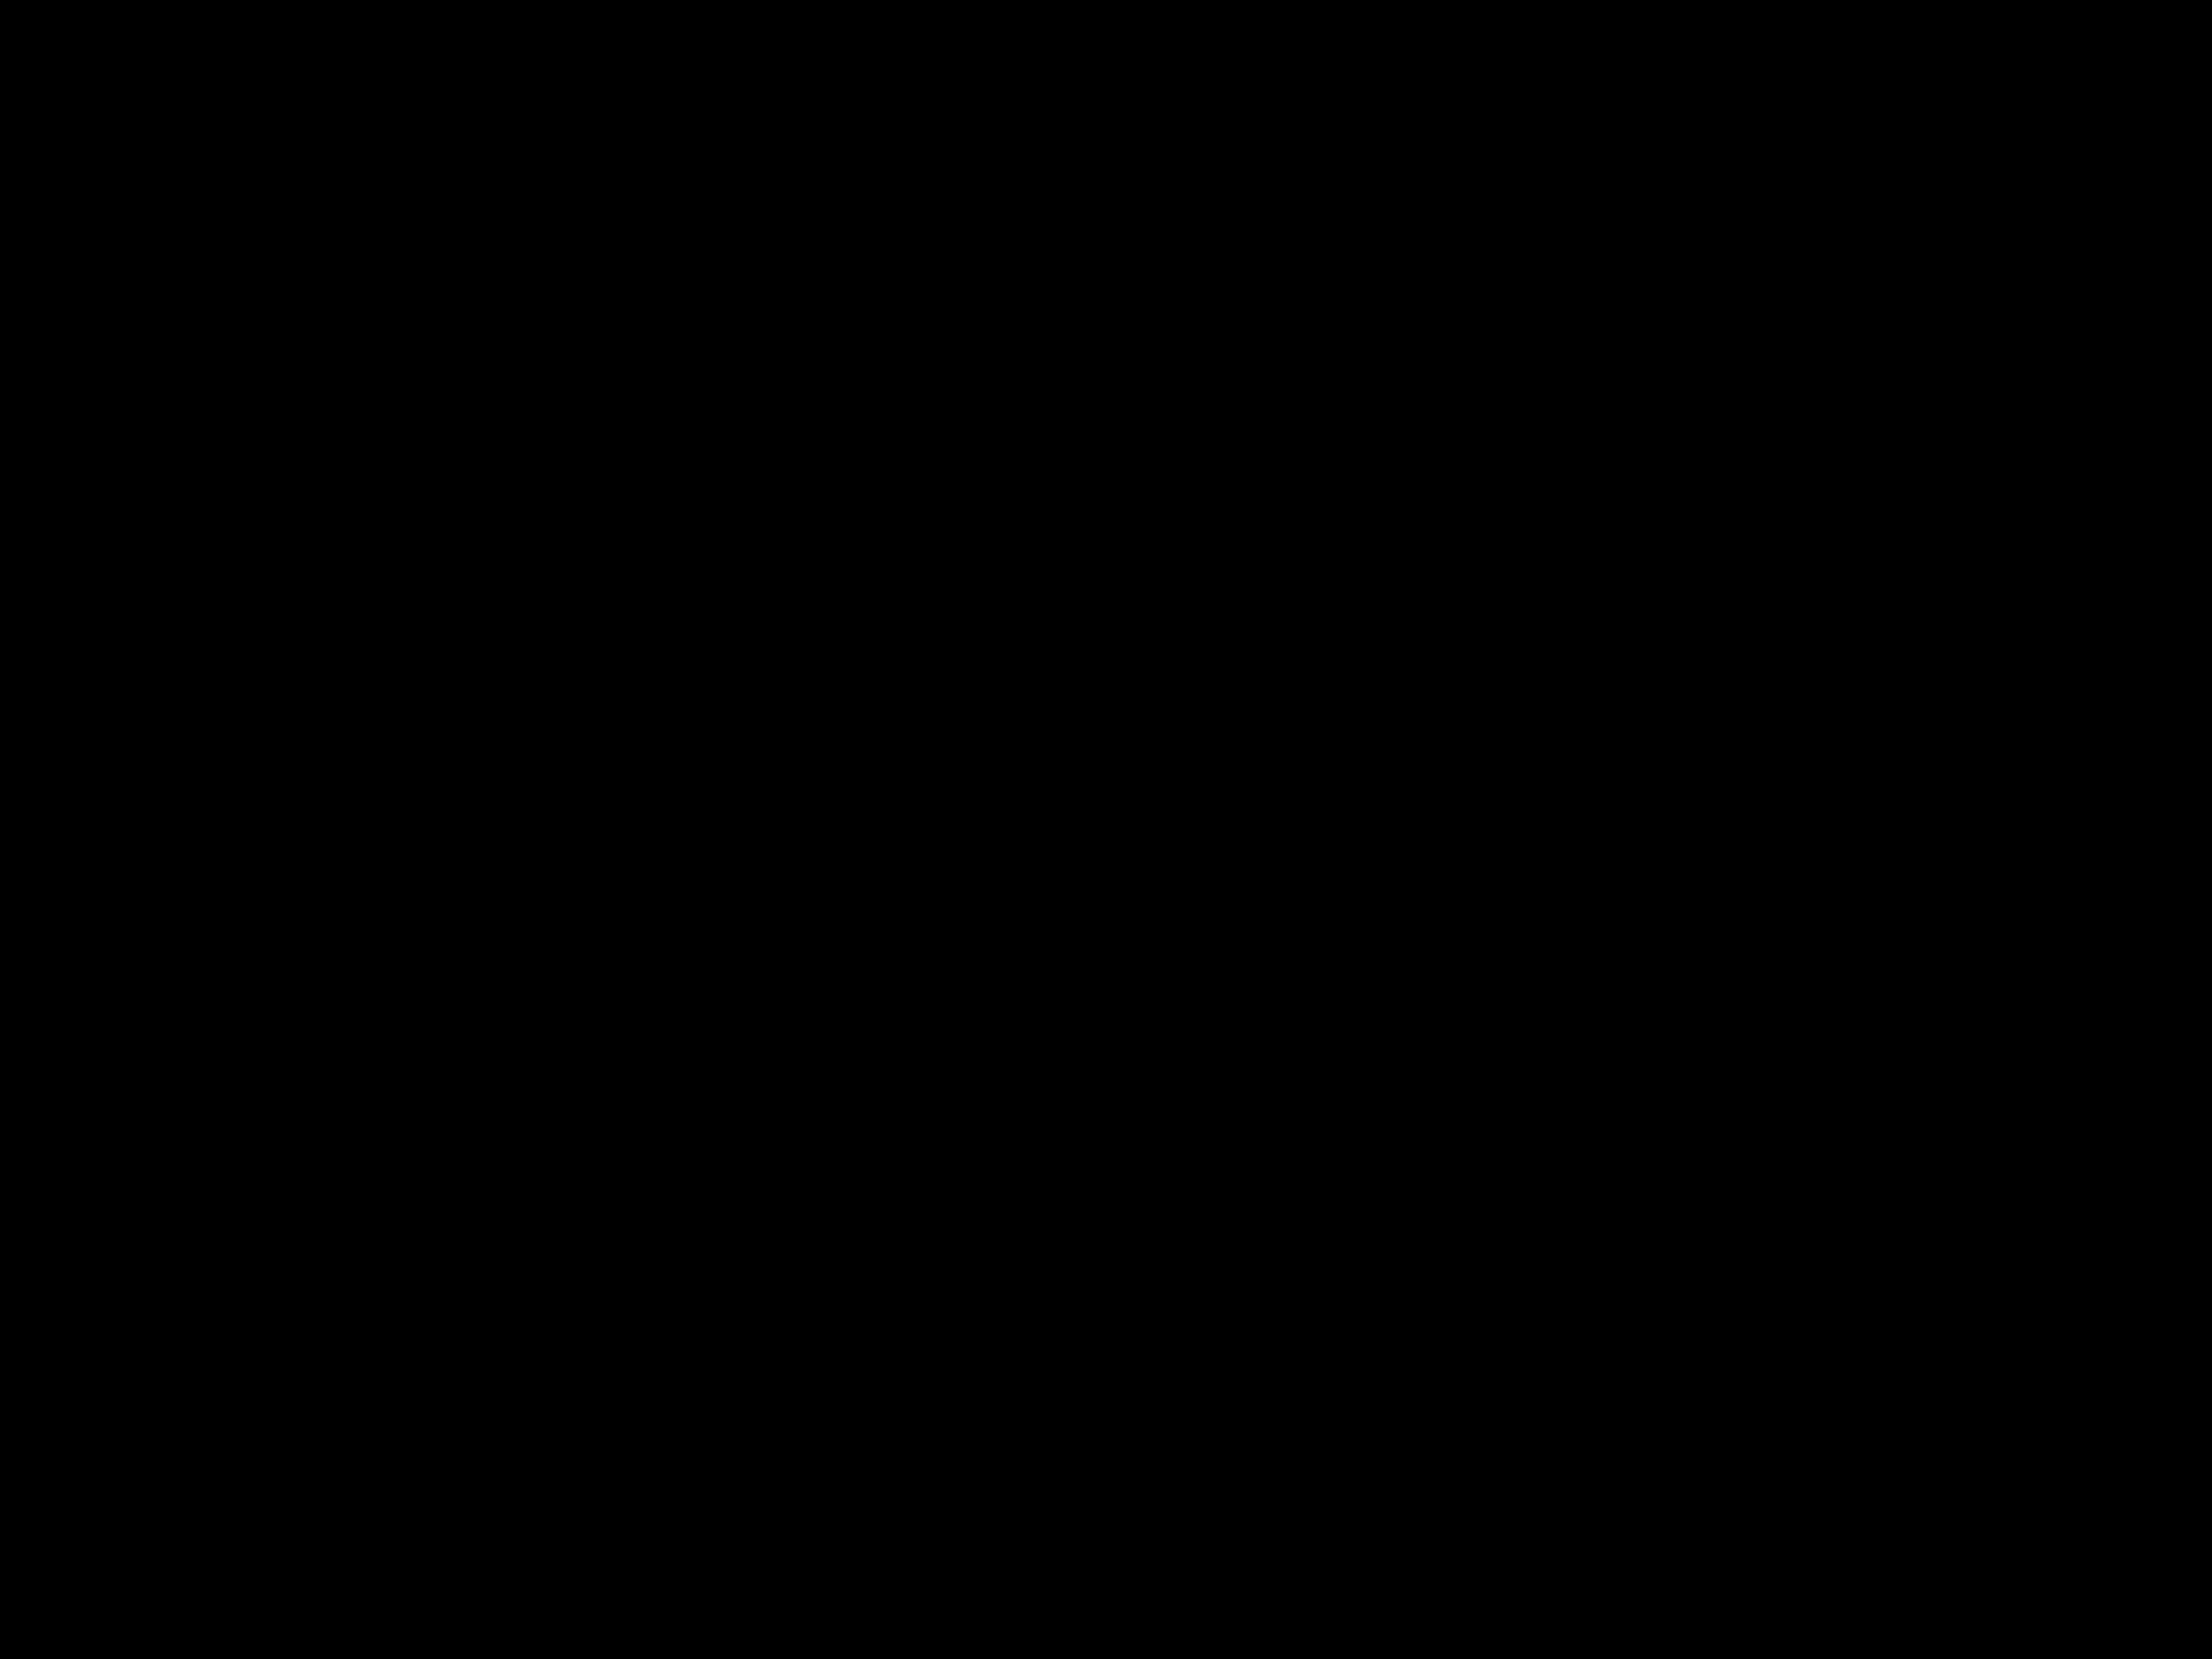 OL 2019